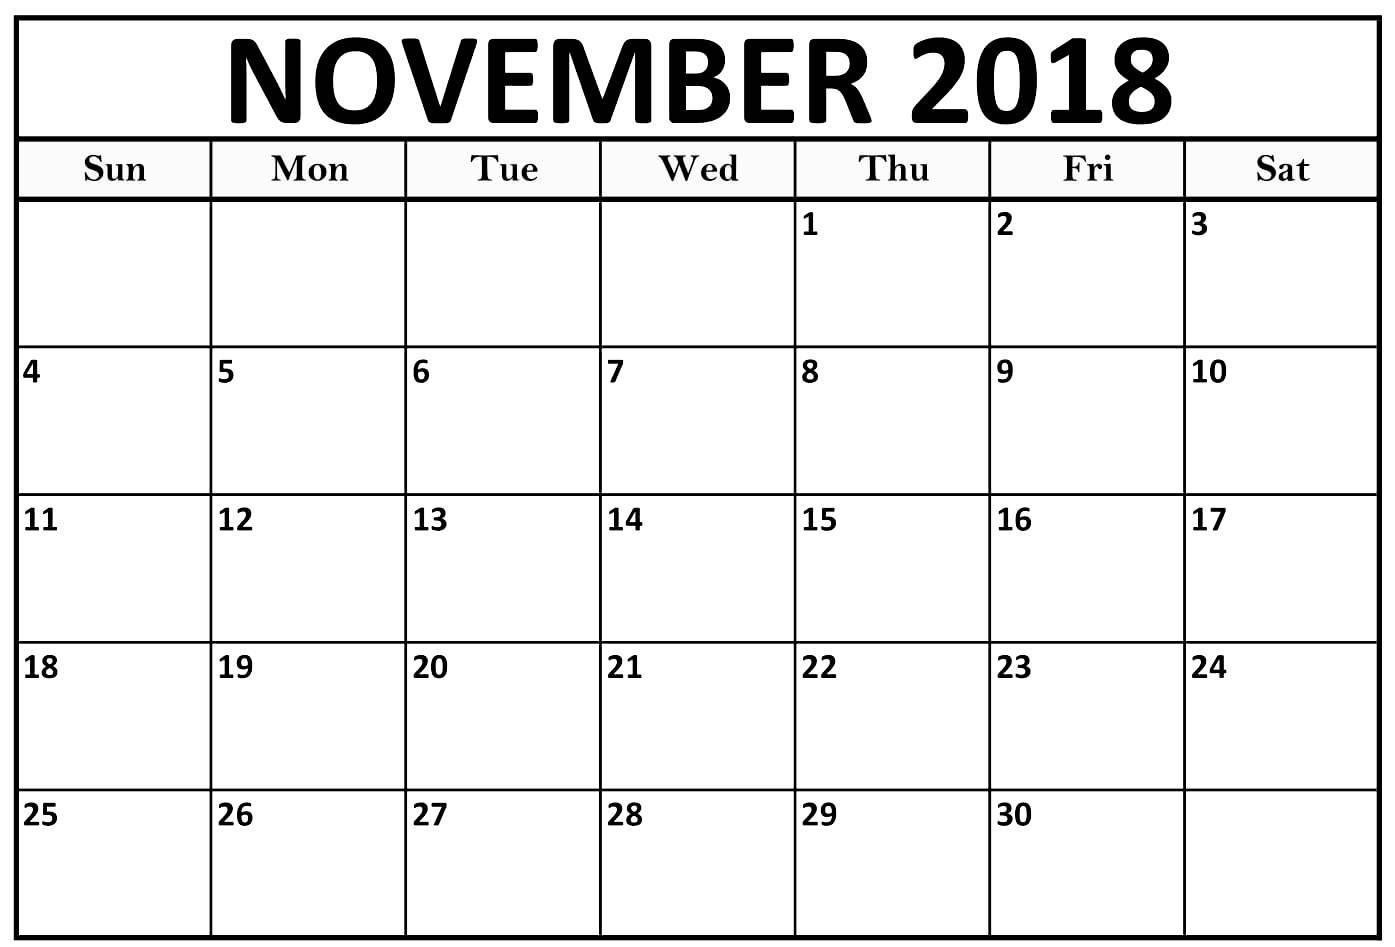 Printable November 2018 Calendar Pdf Free Template within November Calendar Template Free